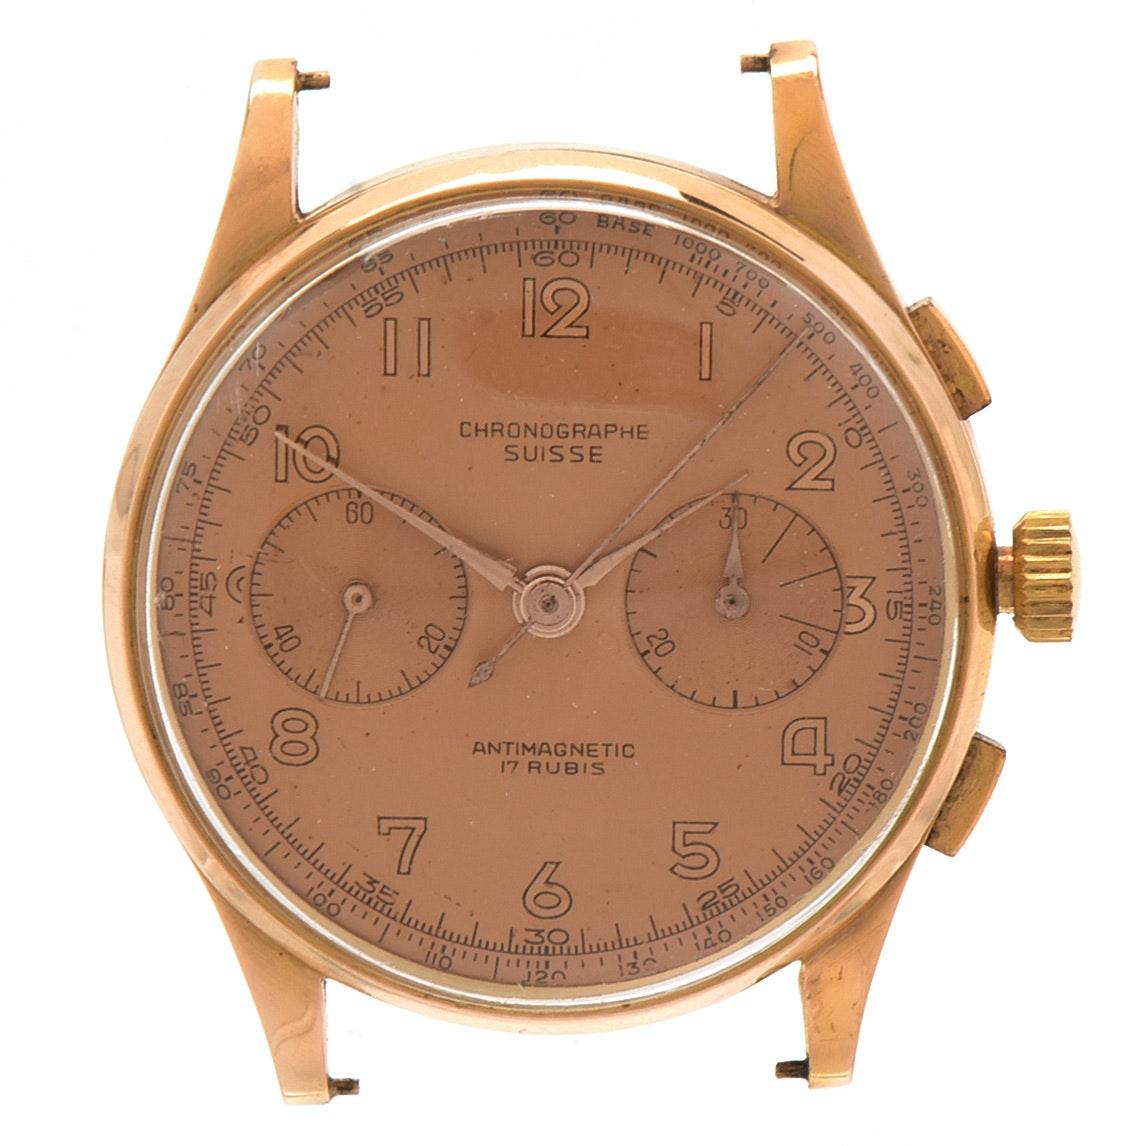 14K Rose Gold Swiss Made Chronograph Watch